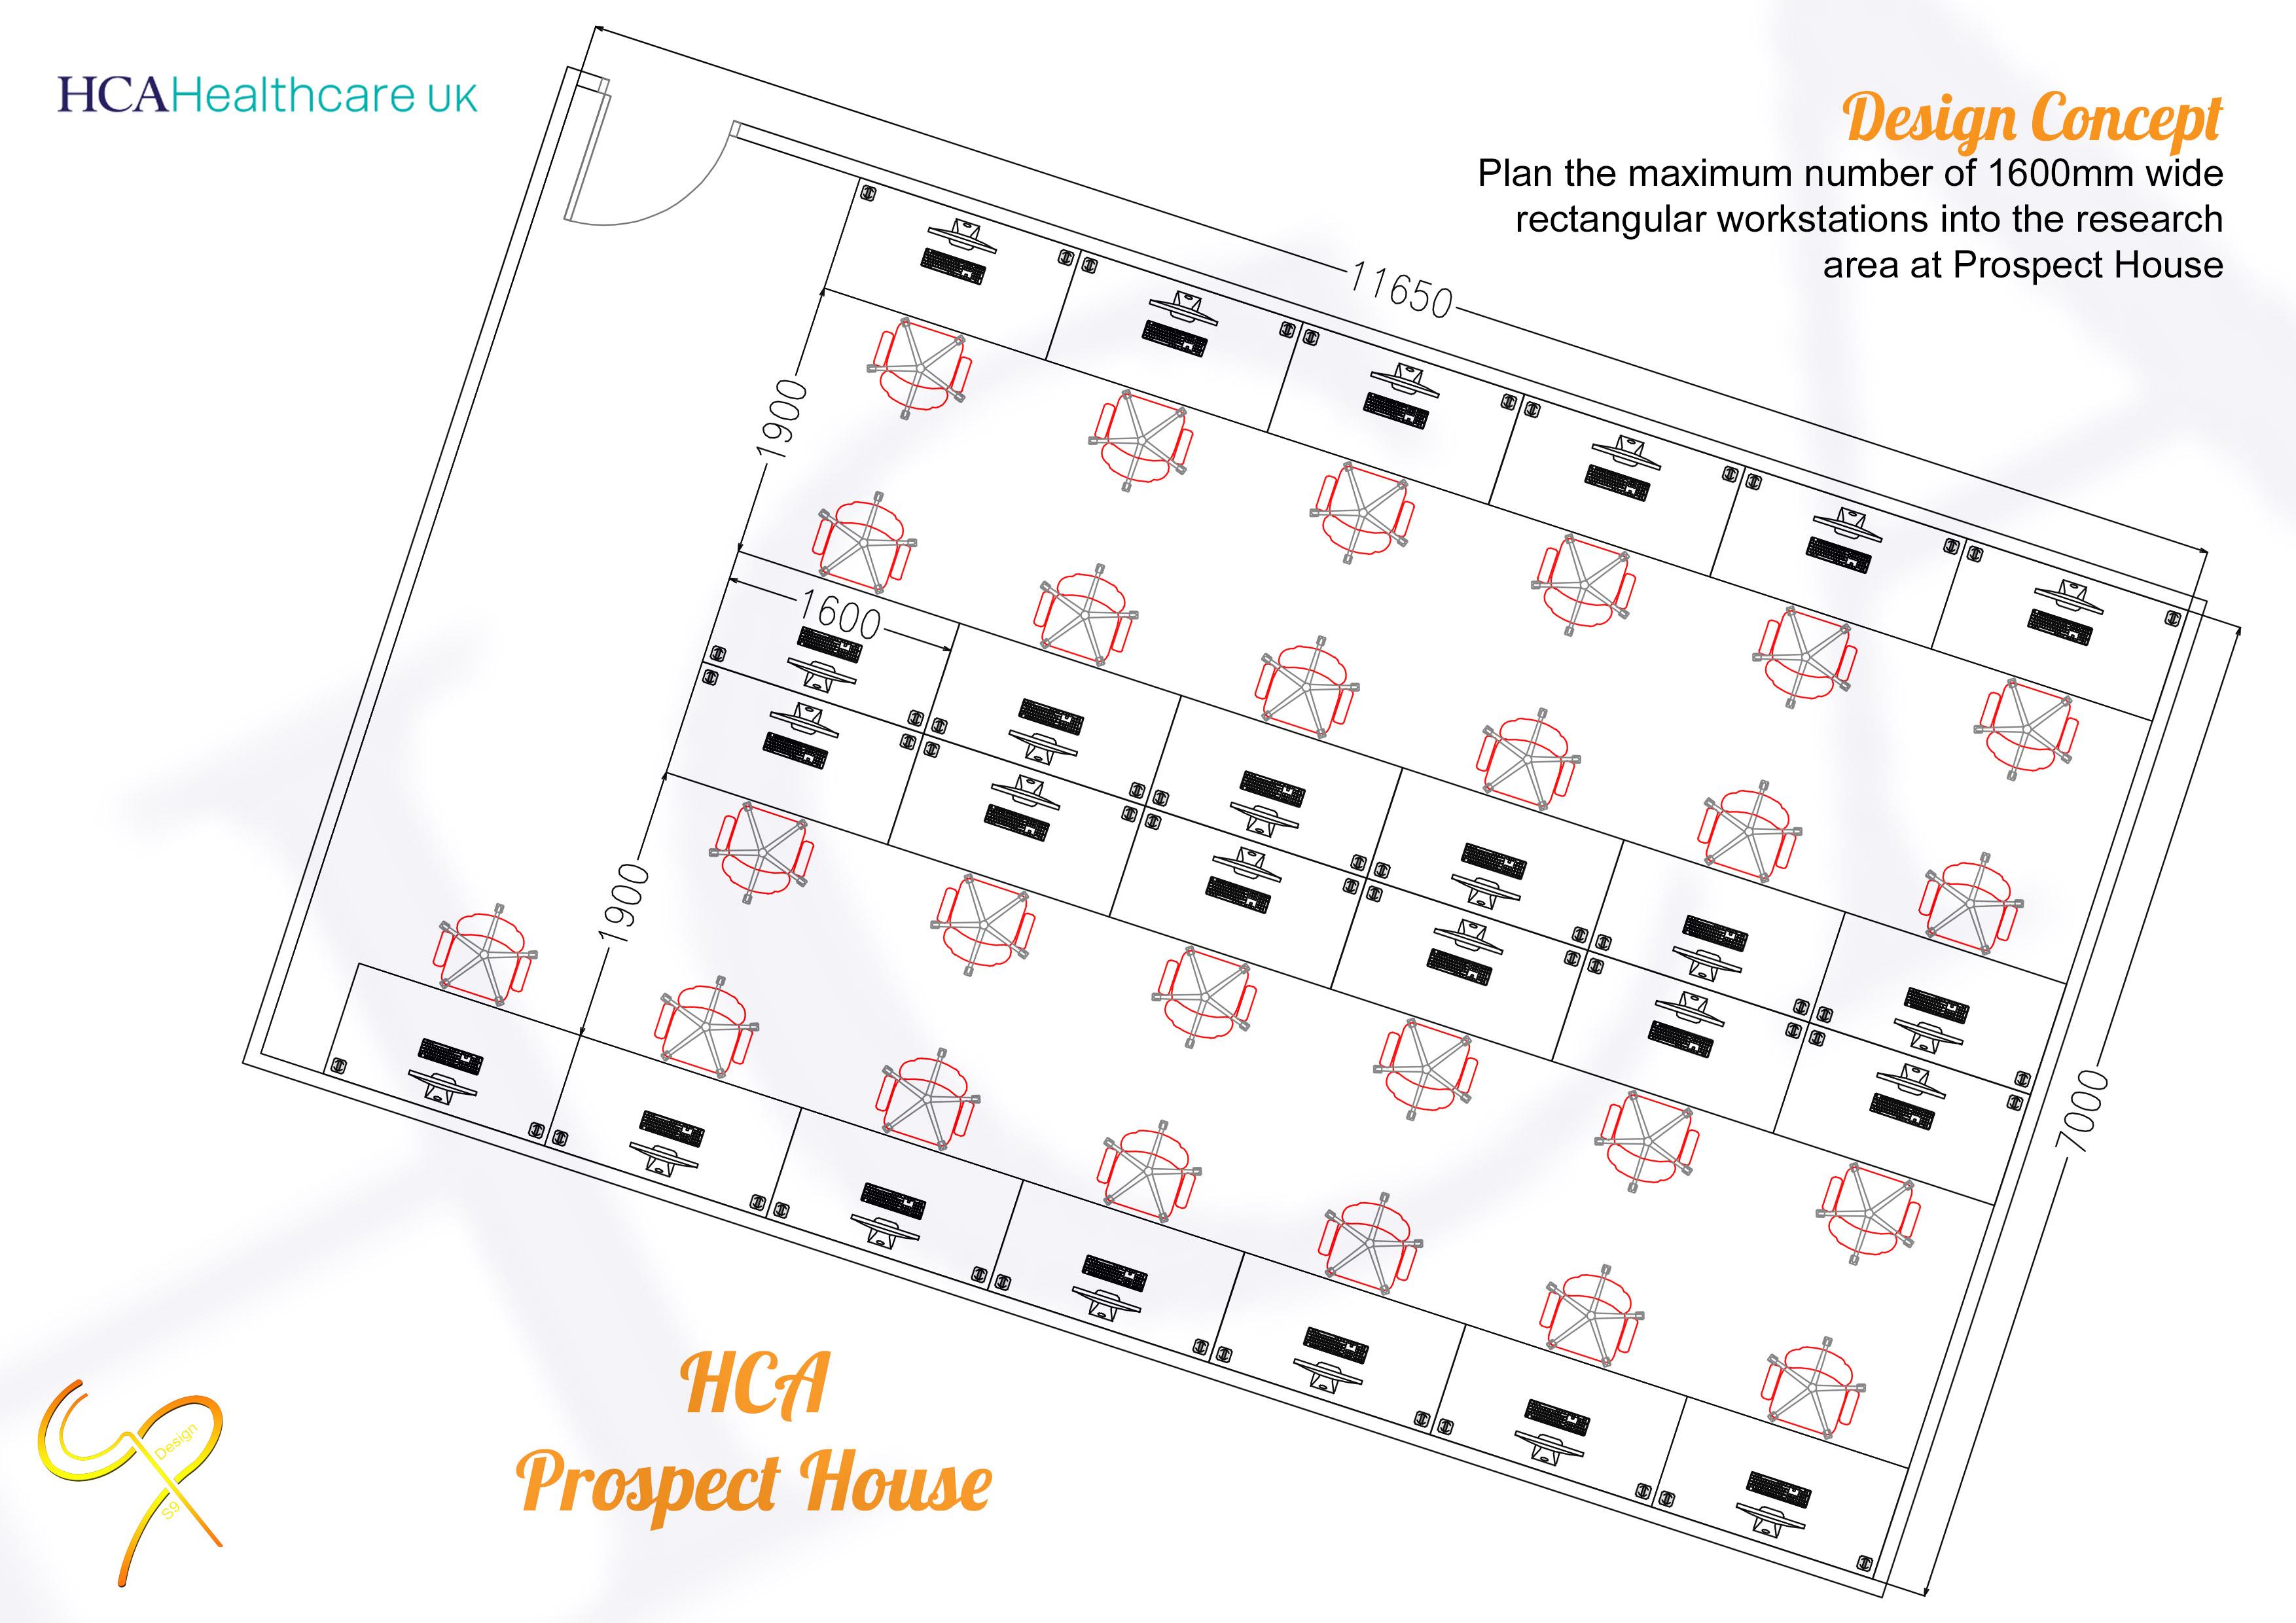 HCA - Prospect House